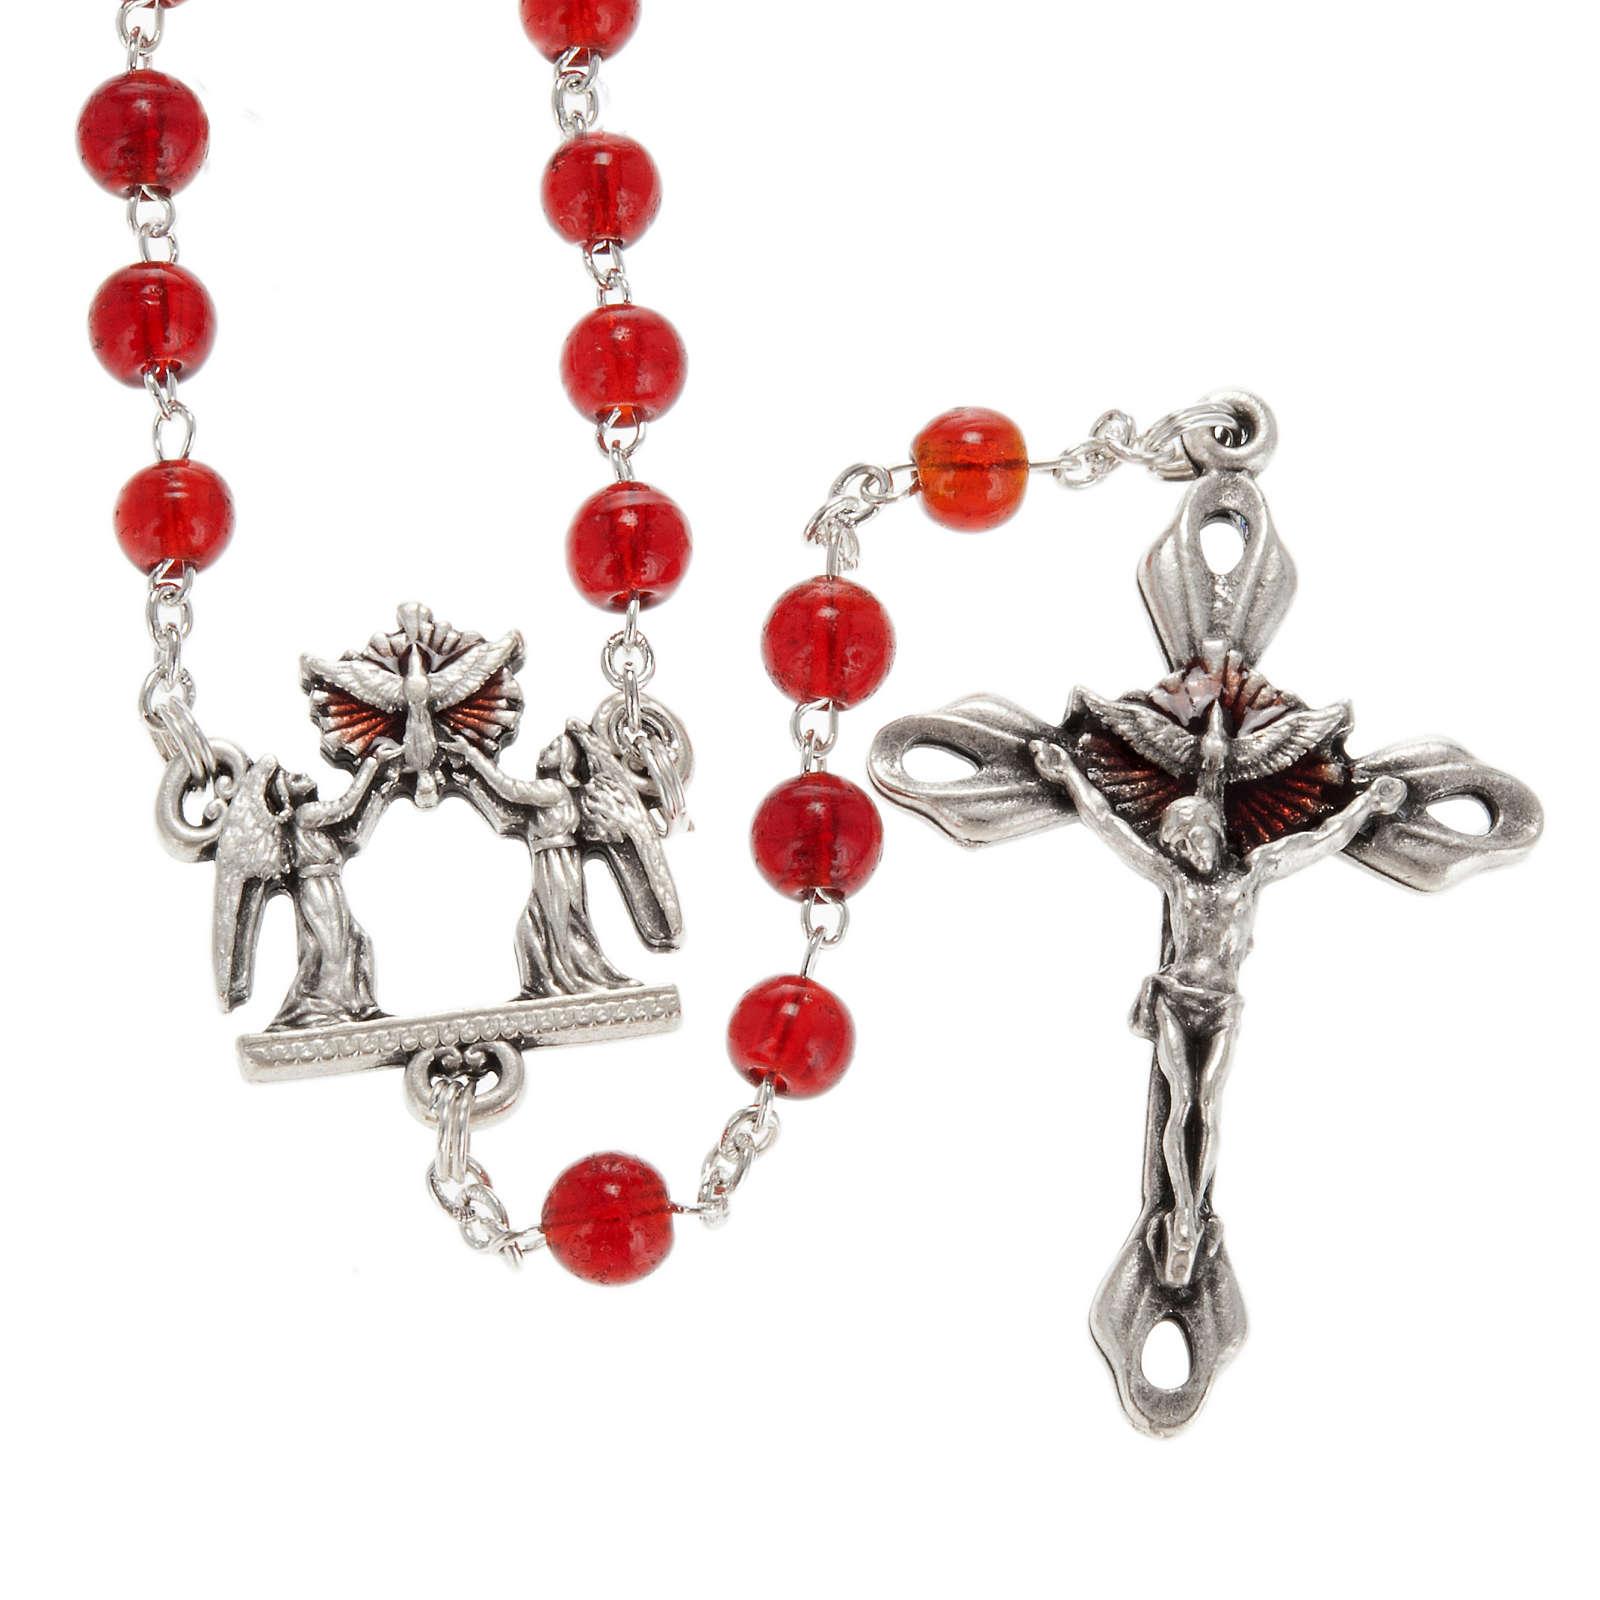 Ghirelli rosary, Bohemia glass, Confirmation 6mm 4